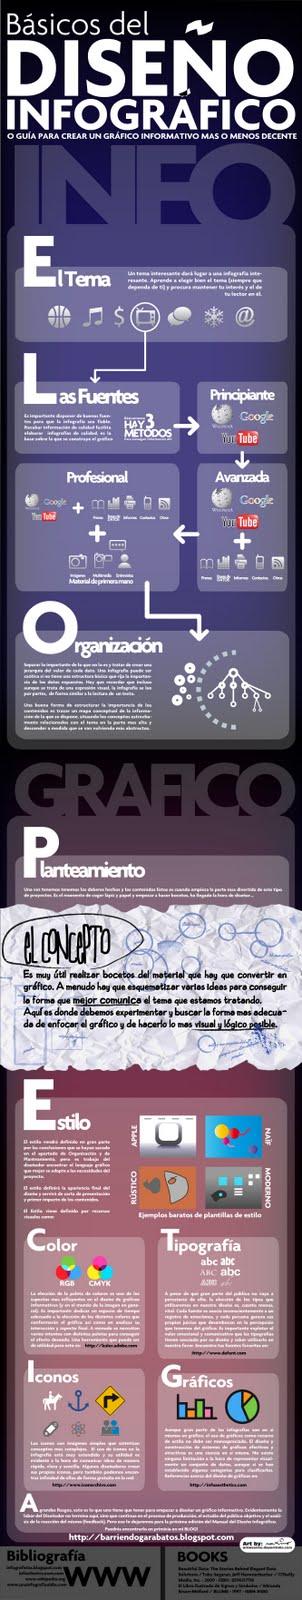 Manual Guia Tutorial de diseño de infografia, o diseño de informacion. Crear una infografia basica, facil, para principiantes. Basicos de la creacion de graficos informativos, visualización de datos.